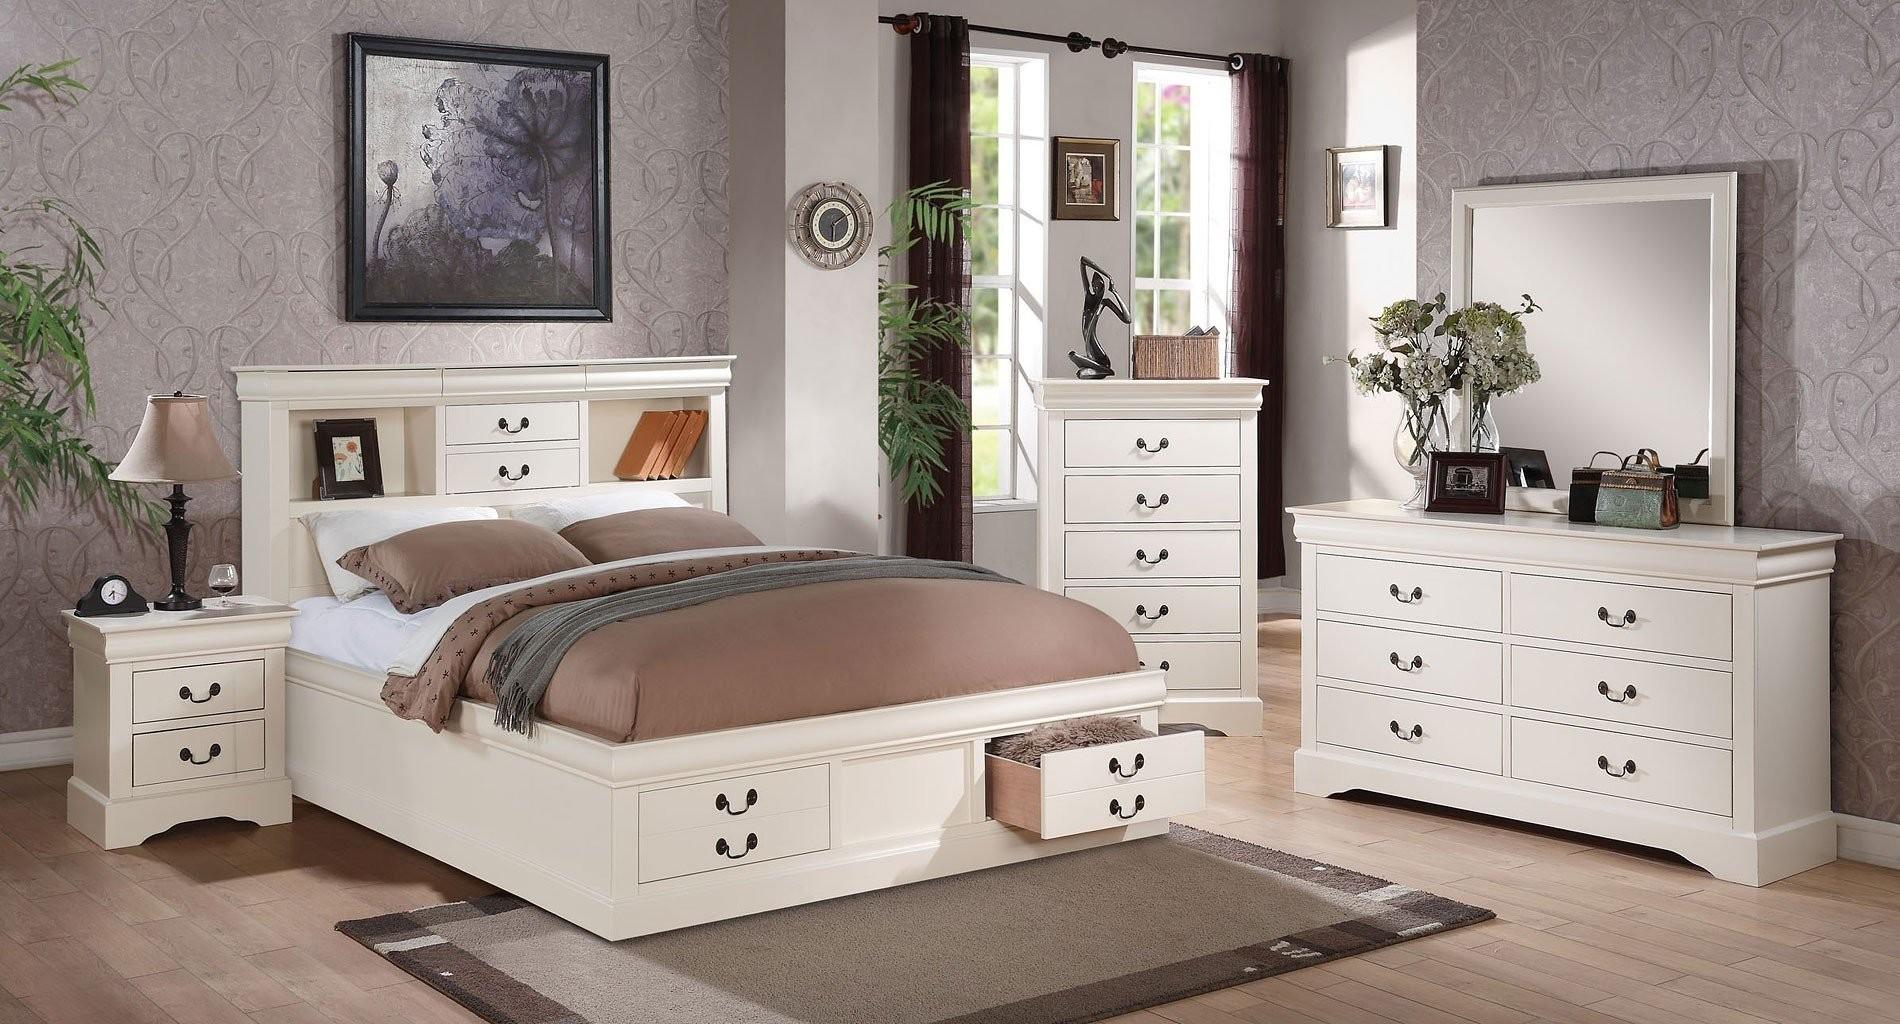 Louis philippe iii bookcase bedroom set white - Louis philippe bedroom collection ...